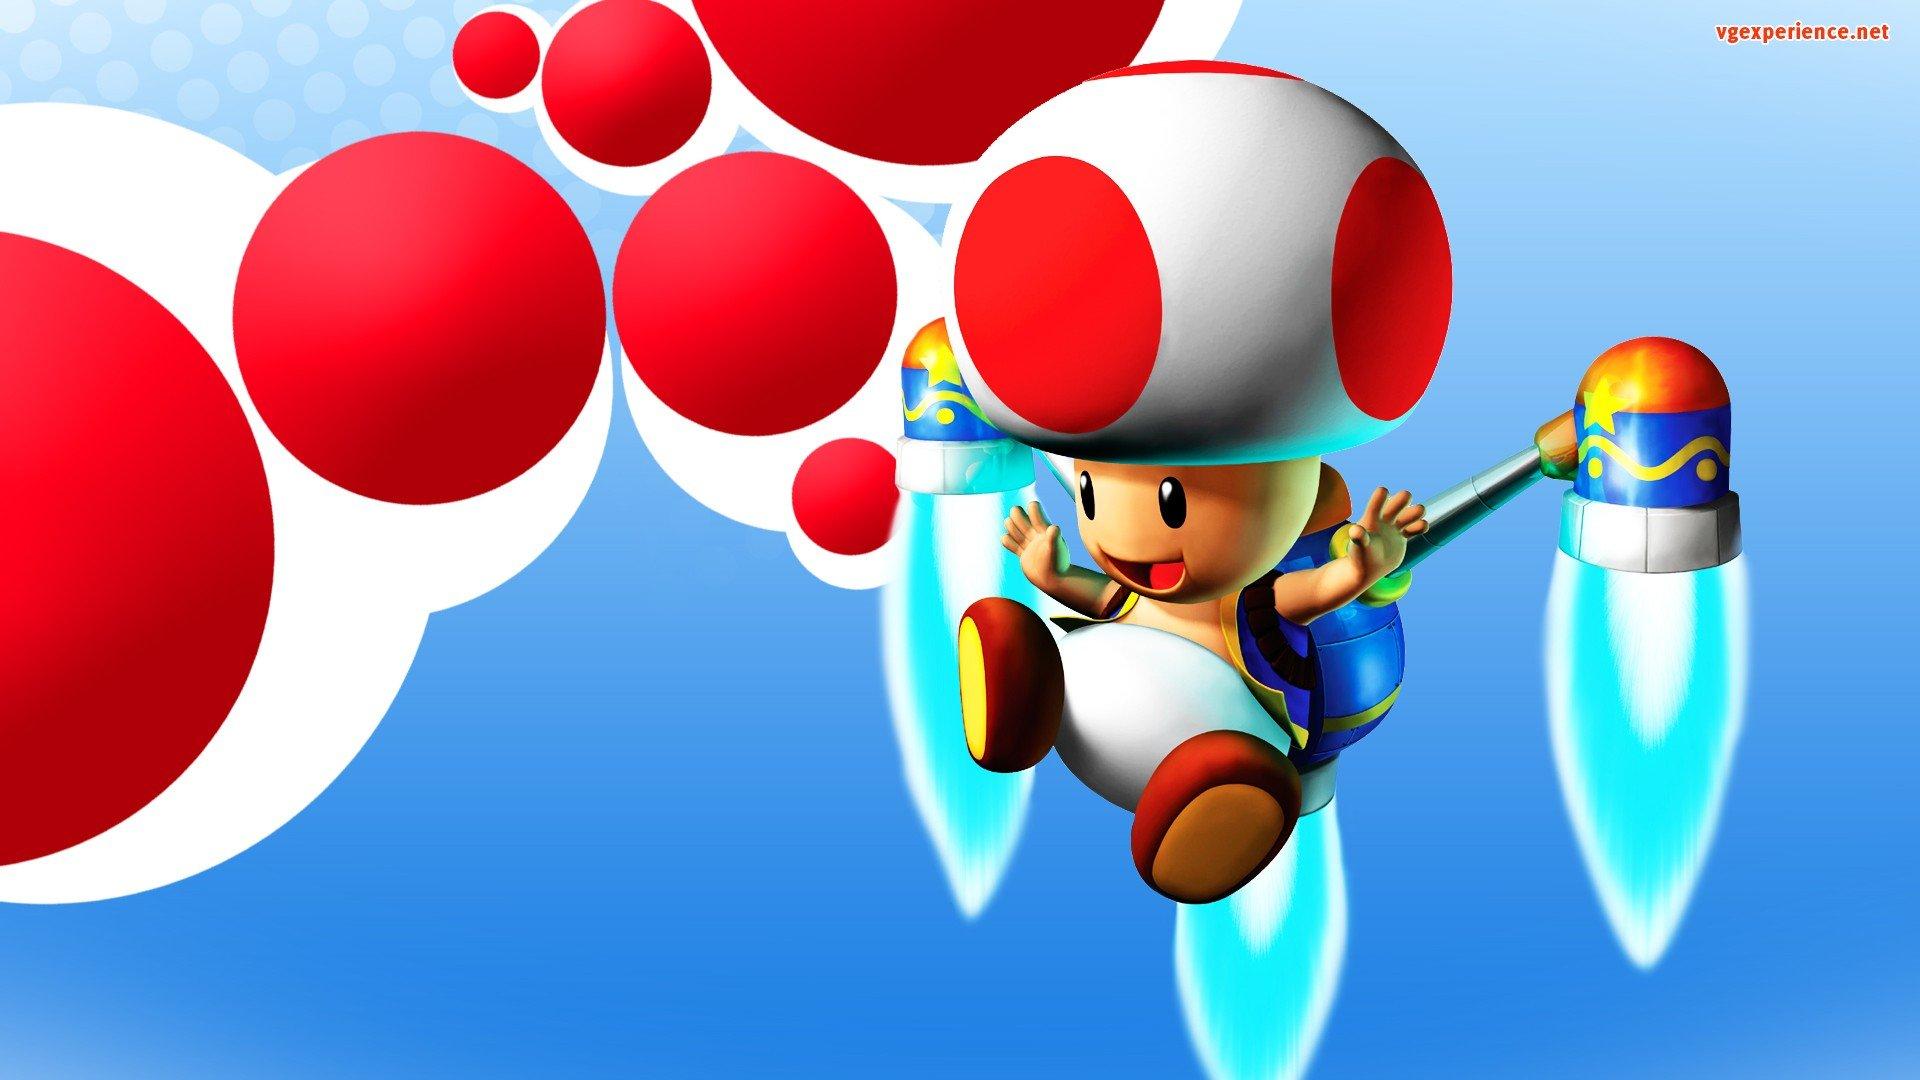 Mario toad (character) wallpaper | 1920x1080 | 302267 ...